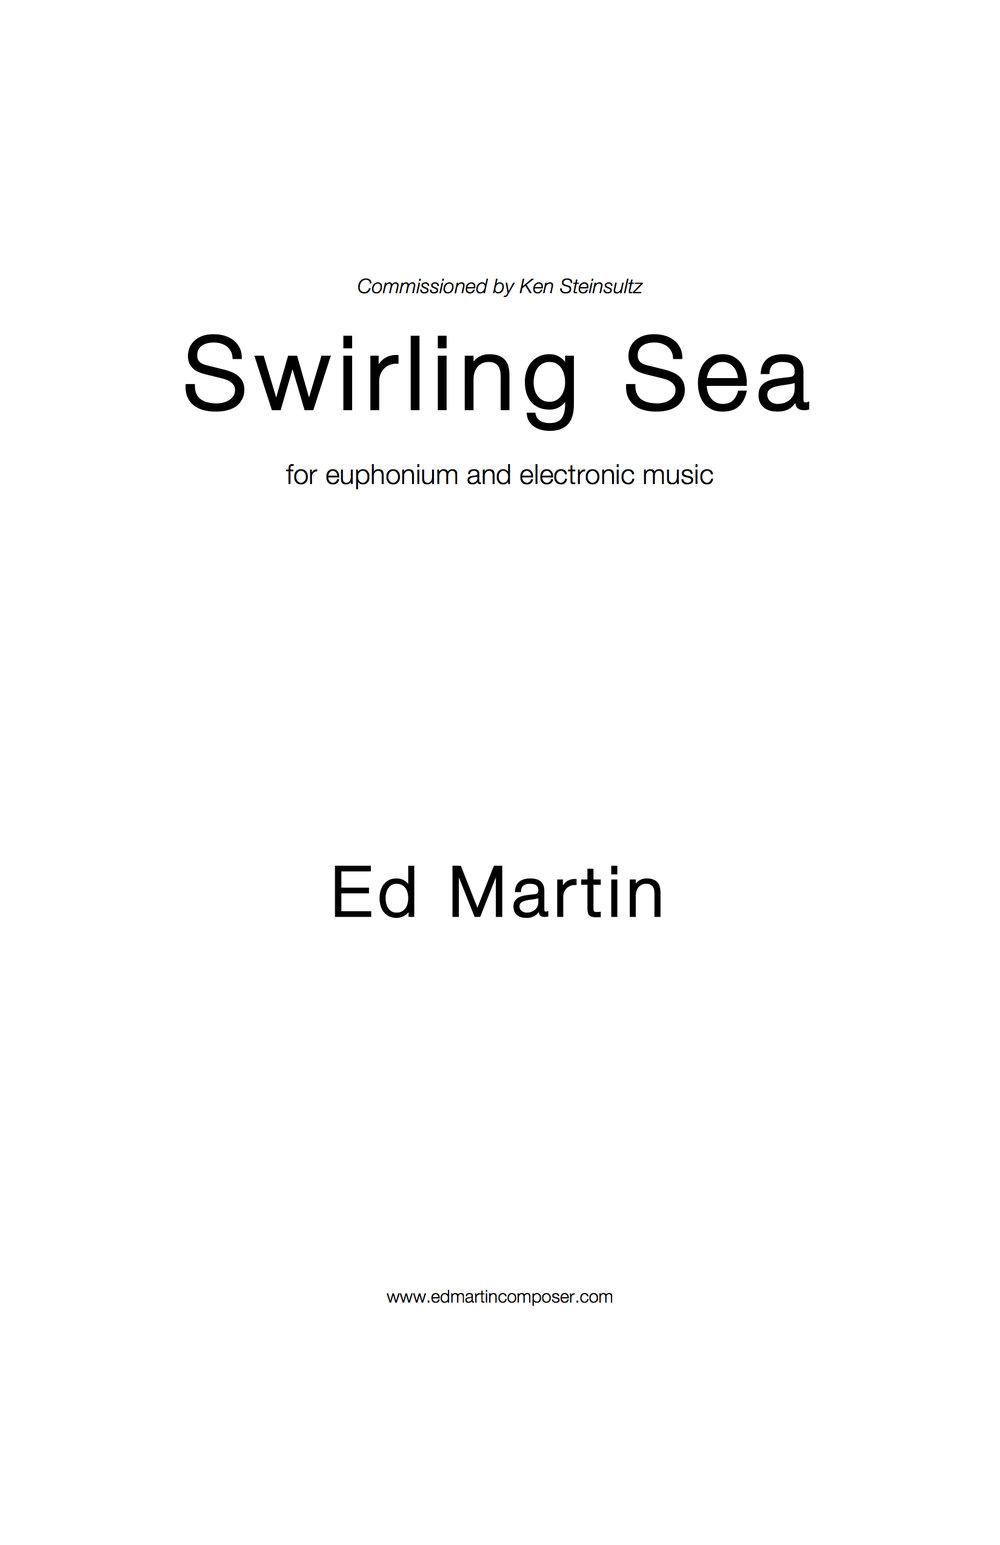 Swirling Sea (dragged).jpg